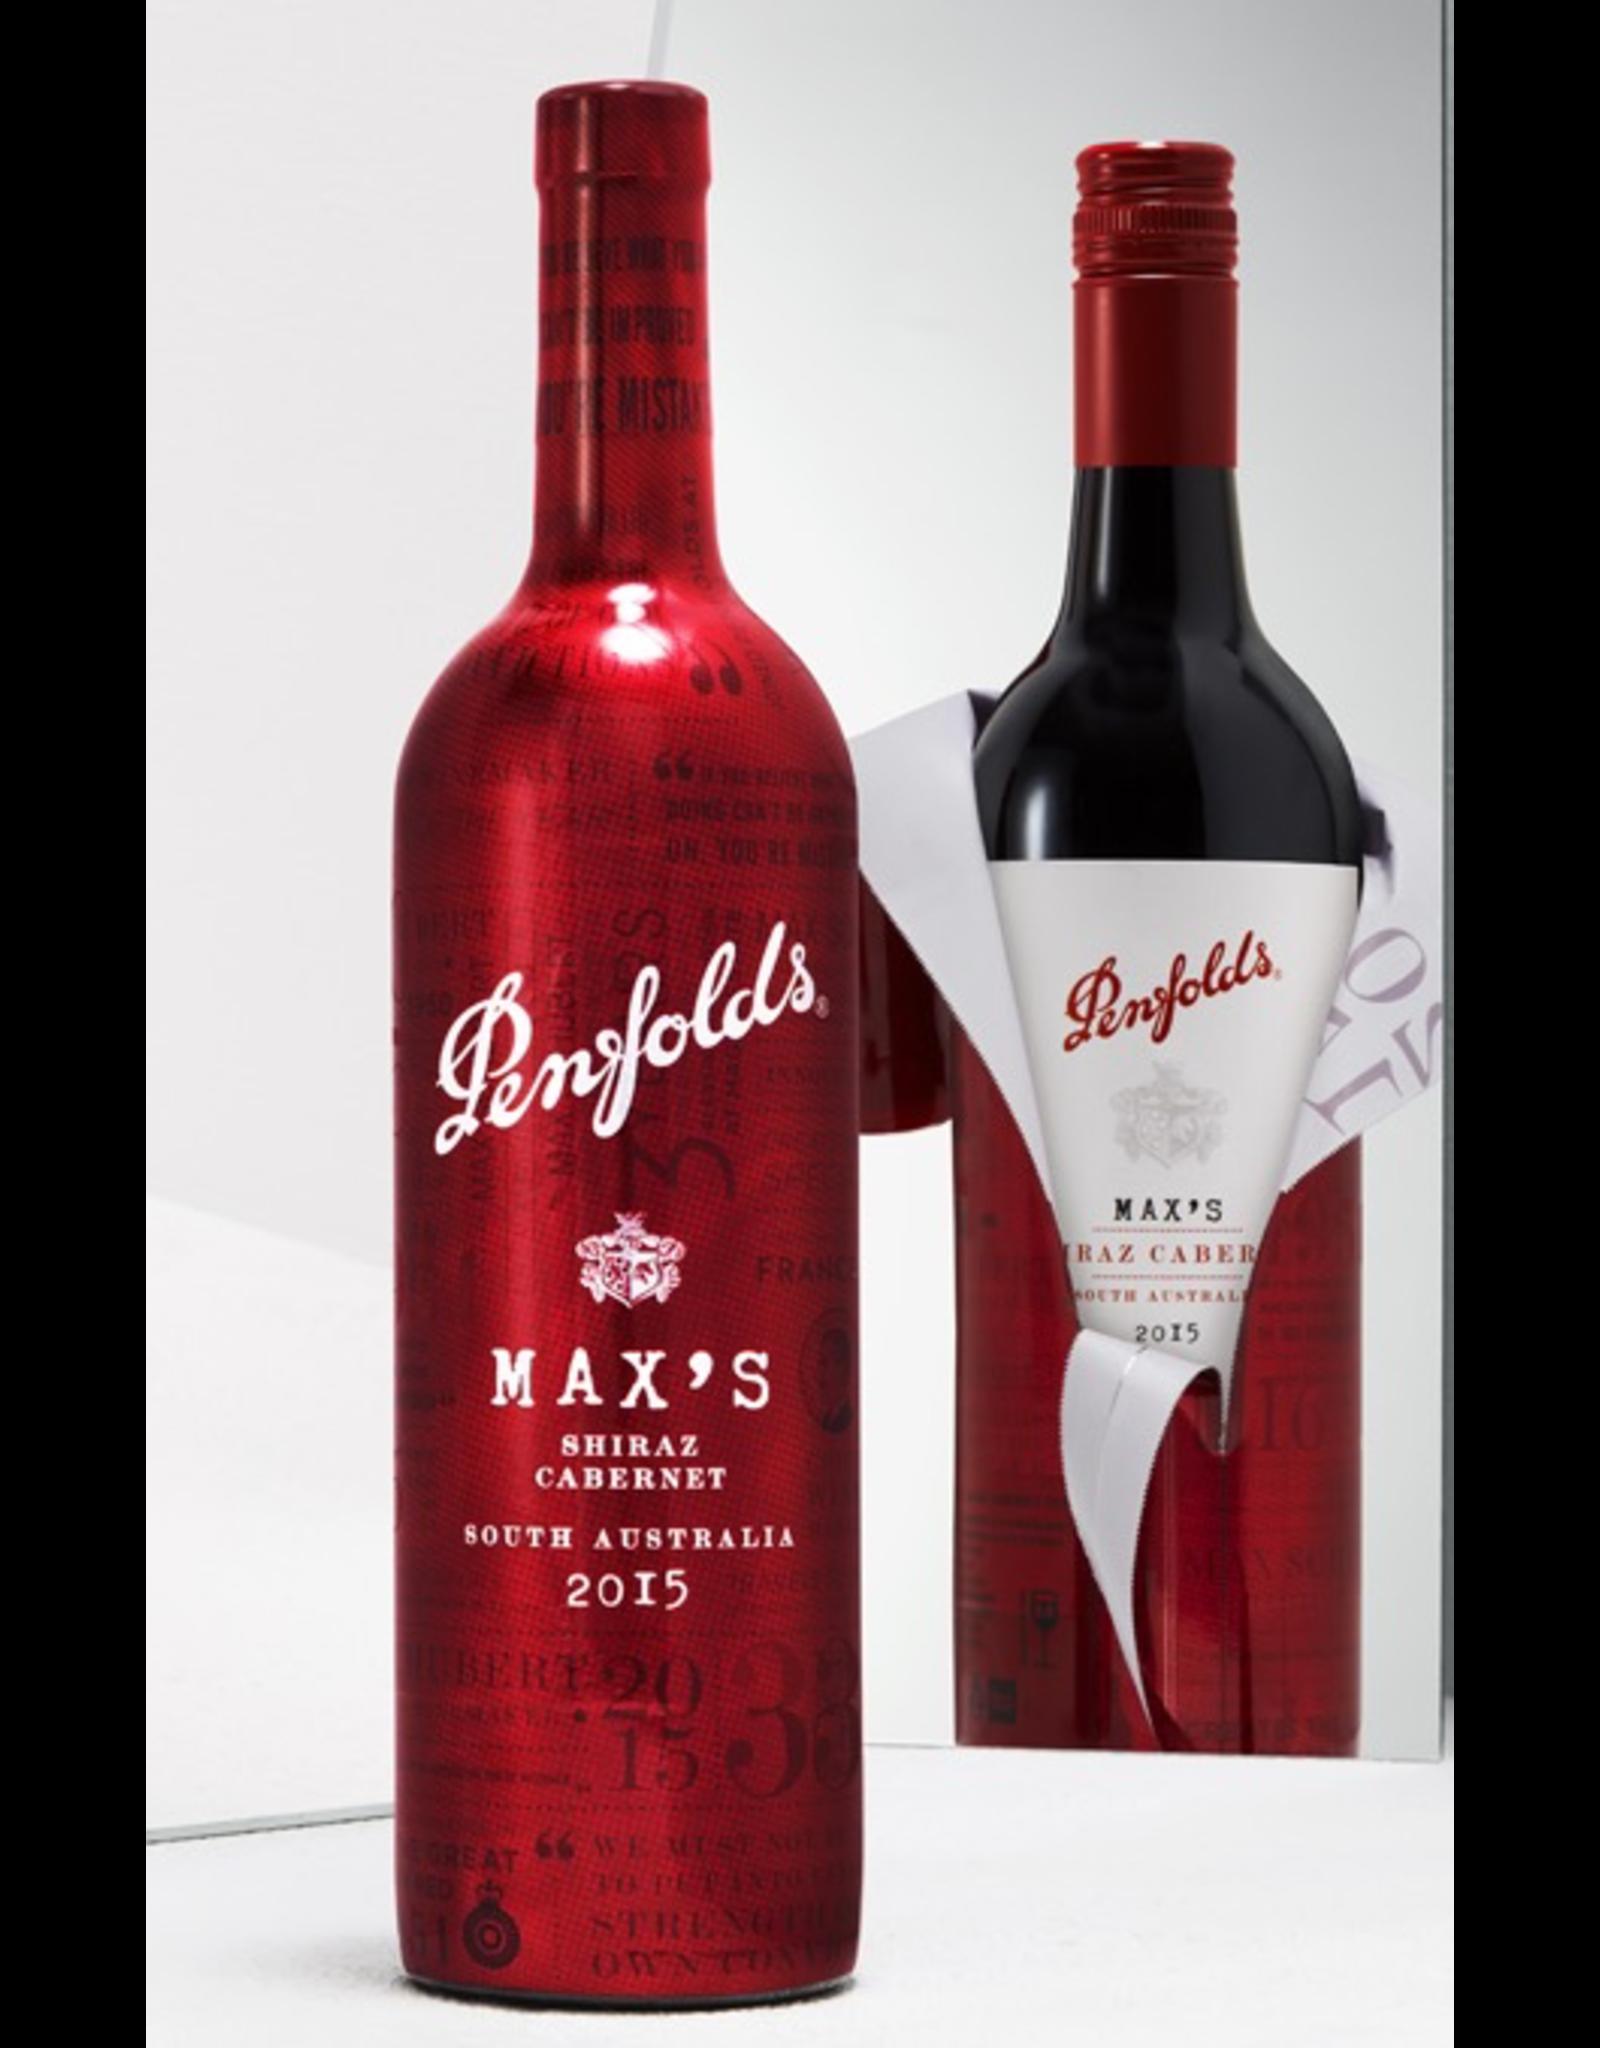 Red Wine 2016, Penfolds MAX's Blend, Red Shiraz Cabernet Blend Barossa Valley, South Australia, 14.5% Alc, CTnr, TW90